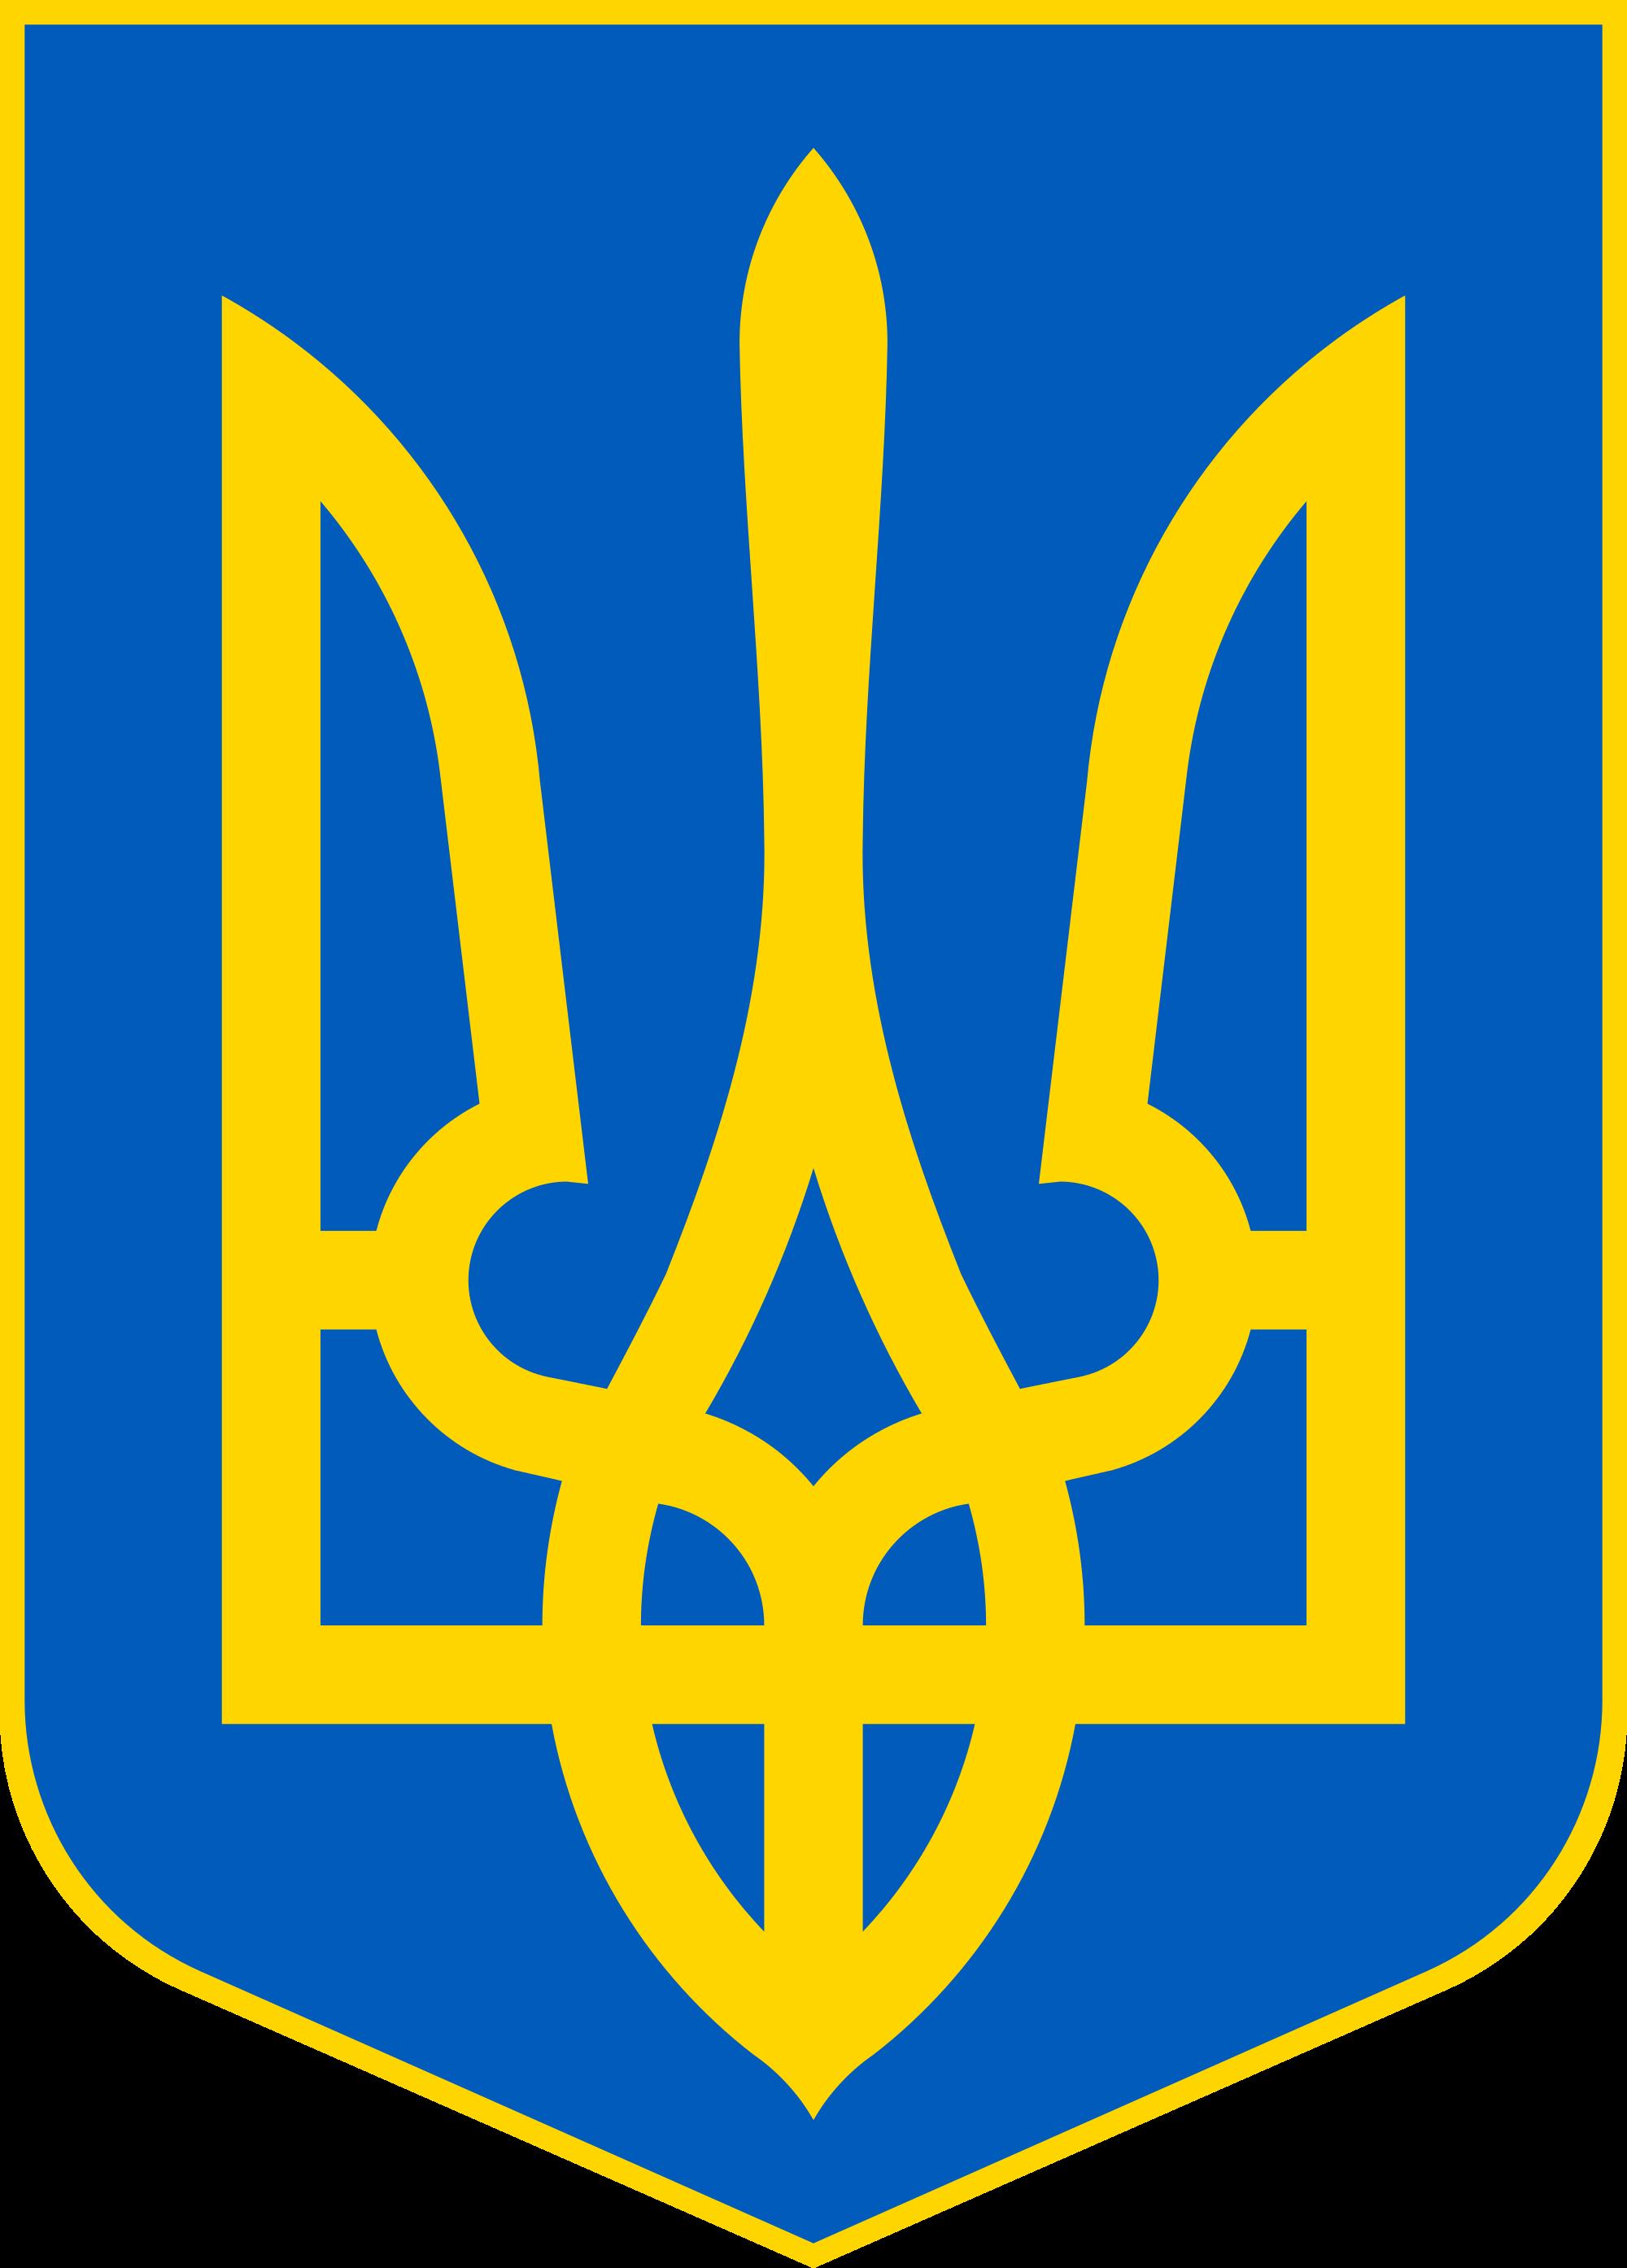 reiestr-vibortsiv